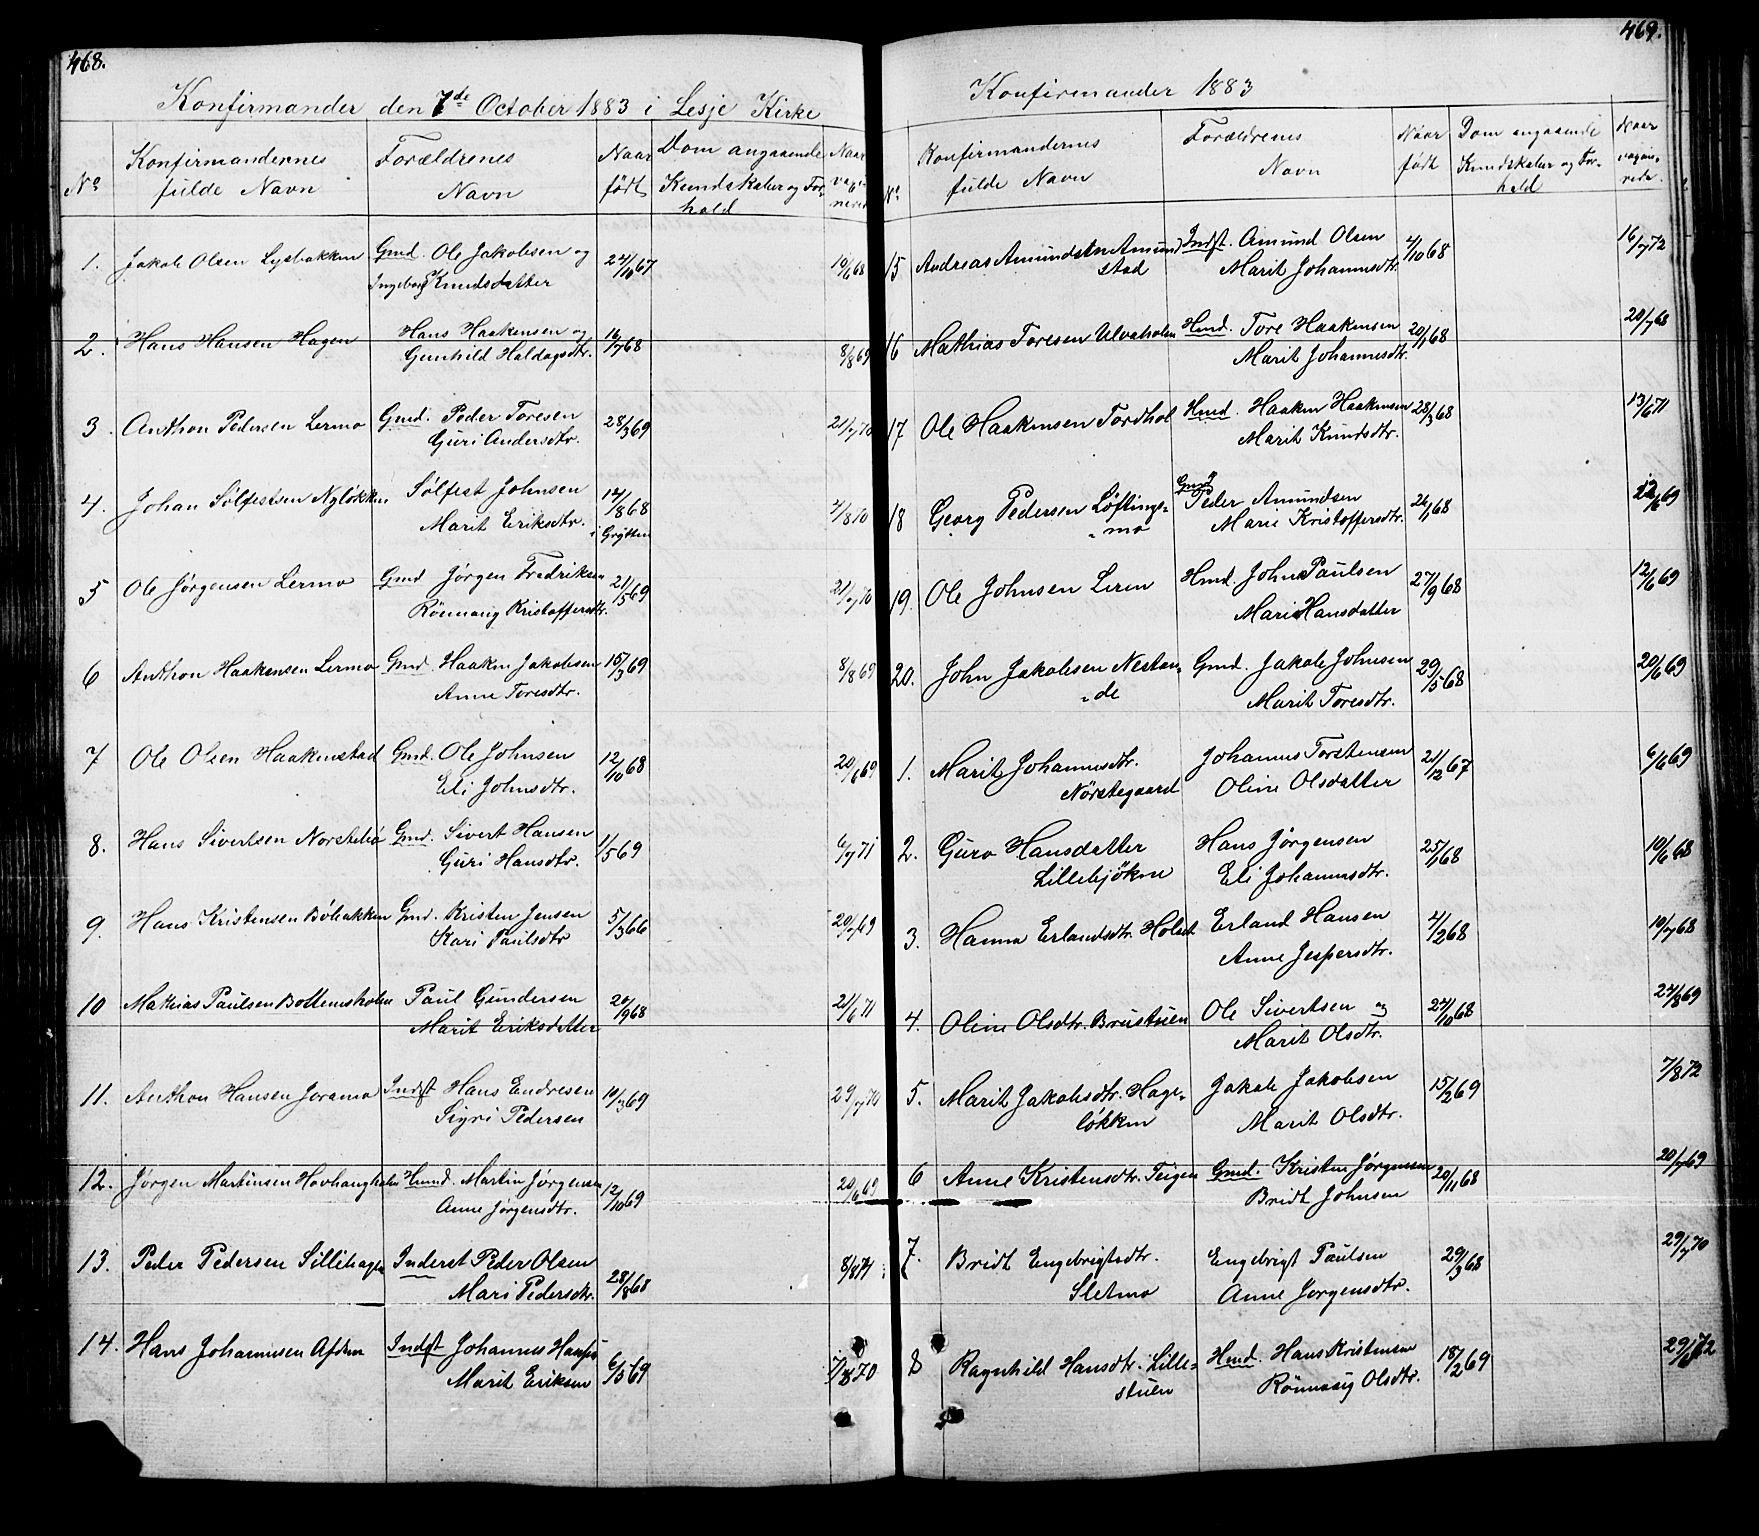 SAH, Lesja prestekontor, Klokkerbok nr. 5, 1850-1894, s. 468-469